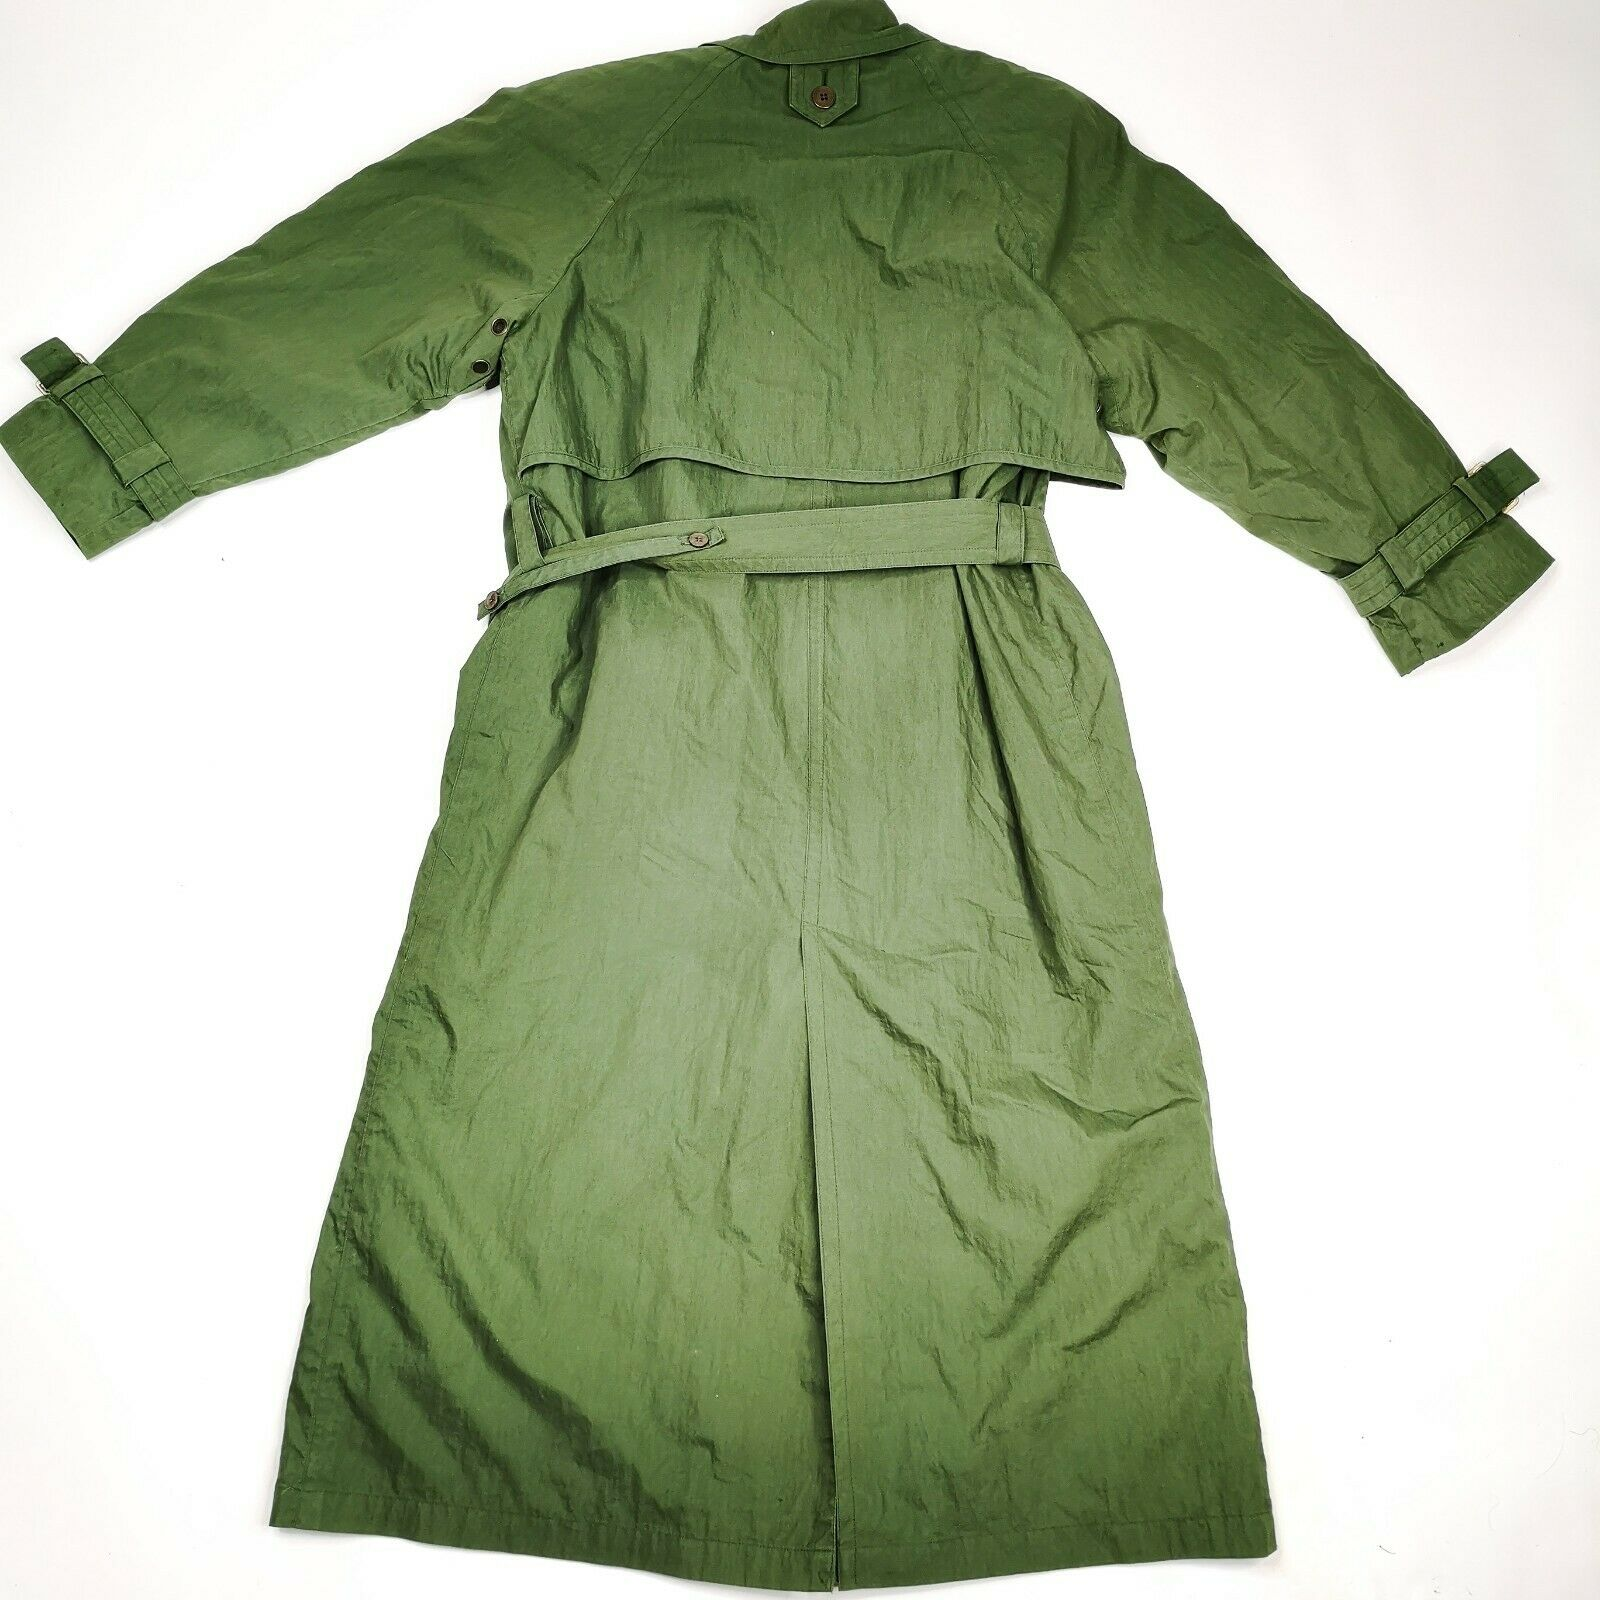 MISTY HARBOR Trench Coat Jacket 8 Olive Green - image 8